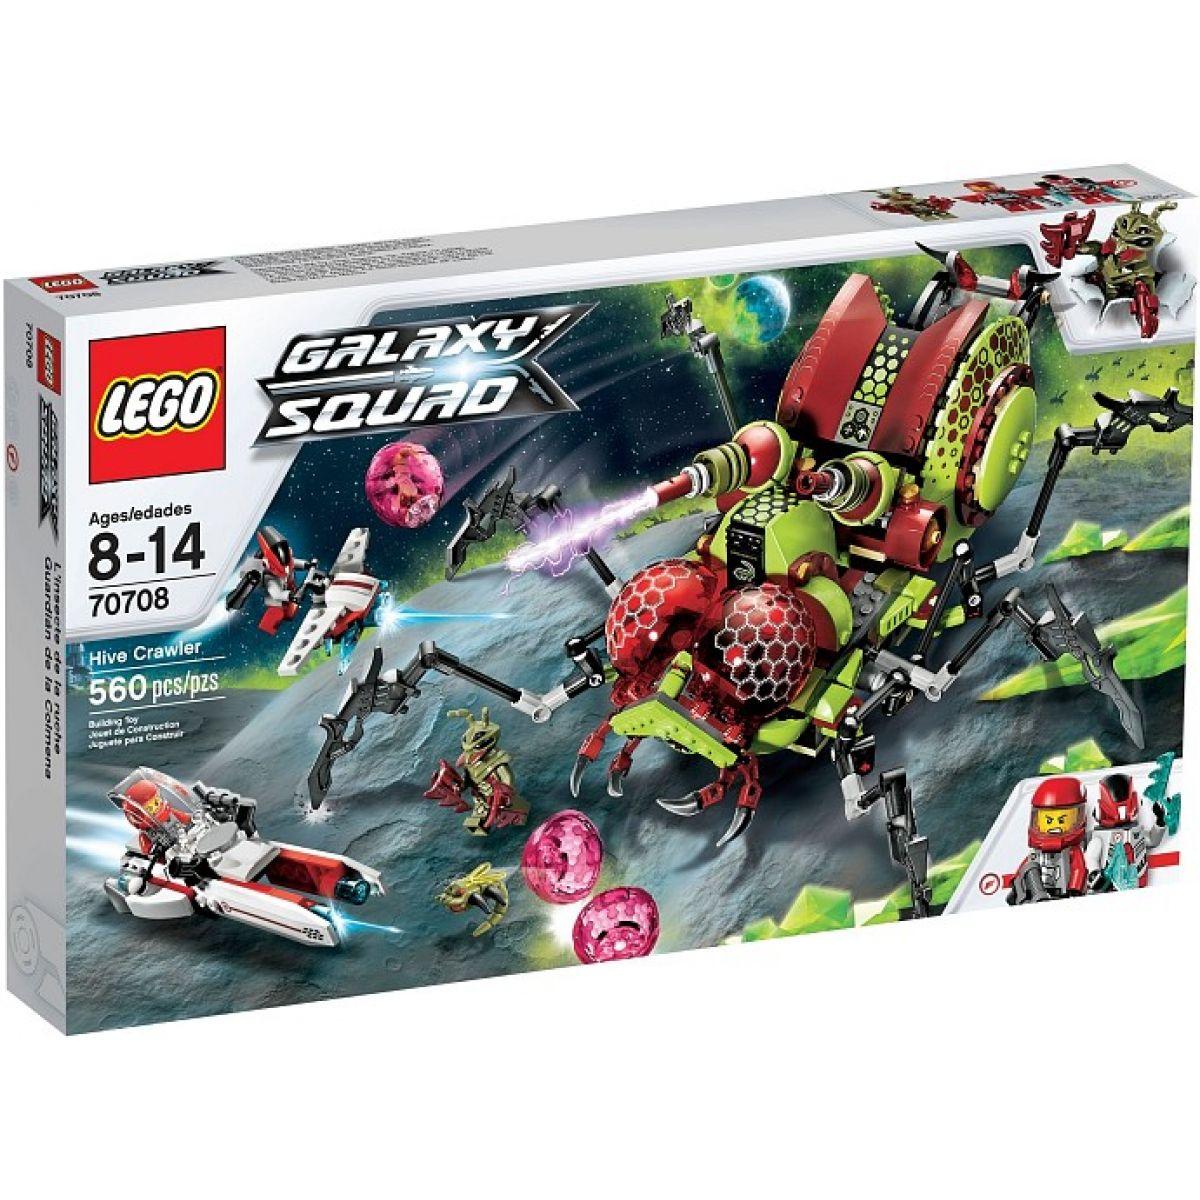 LEGO Galaxy Squad 70708 Žihadloborec